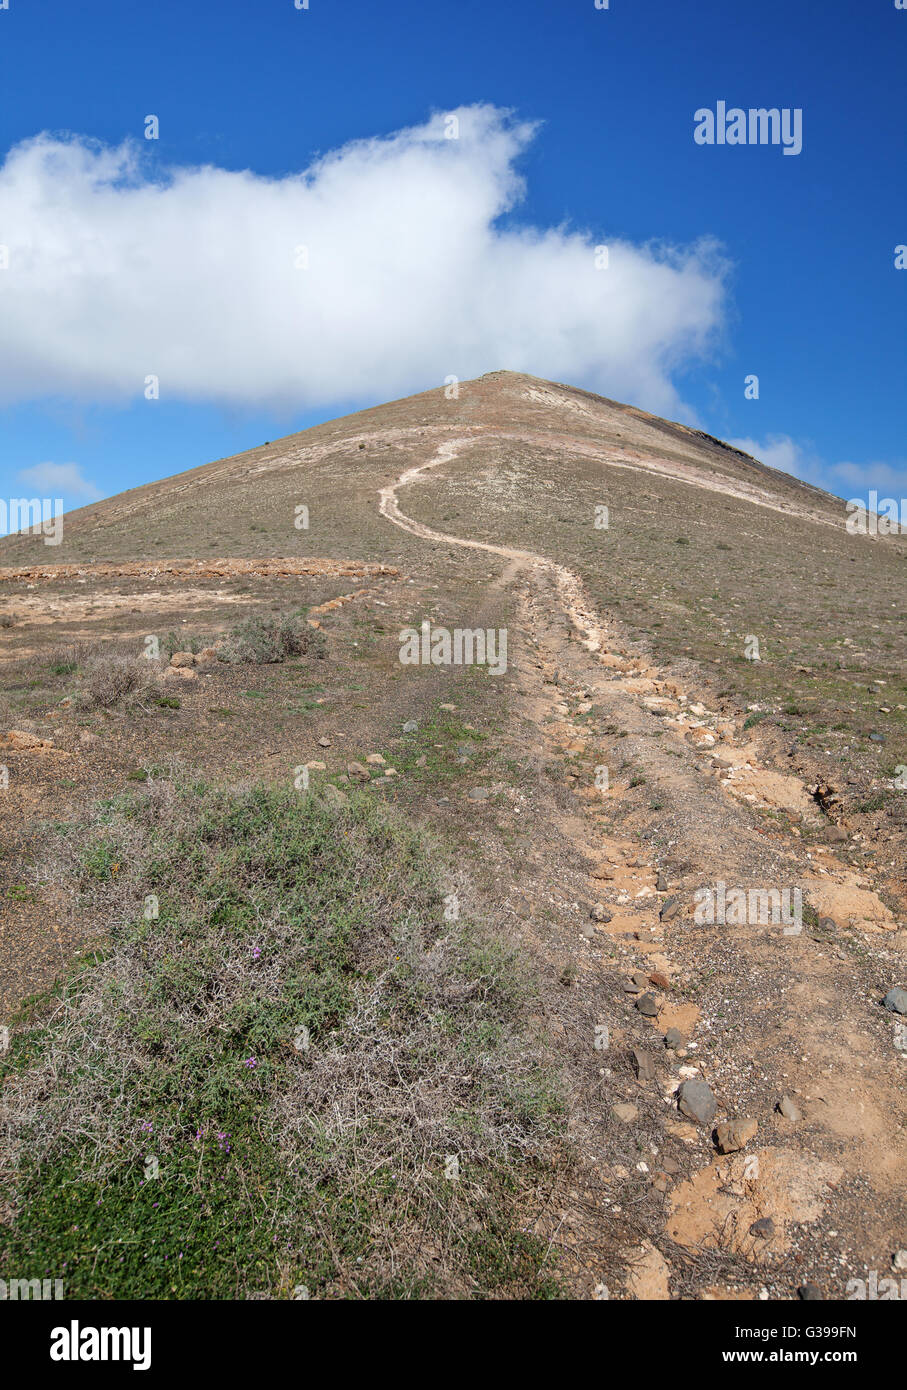 Ascent to the Montana de Guardilama, Lanzarote - Stock Image